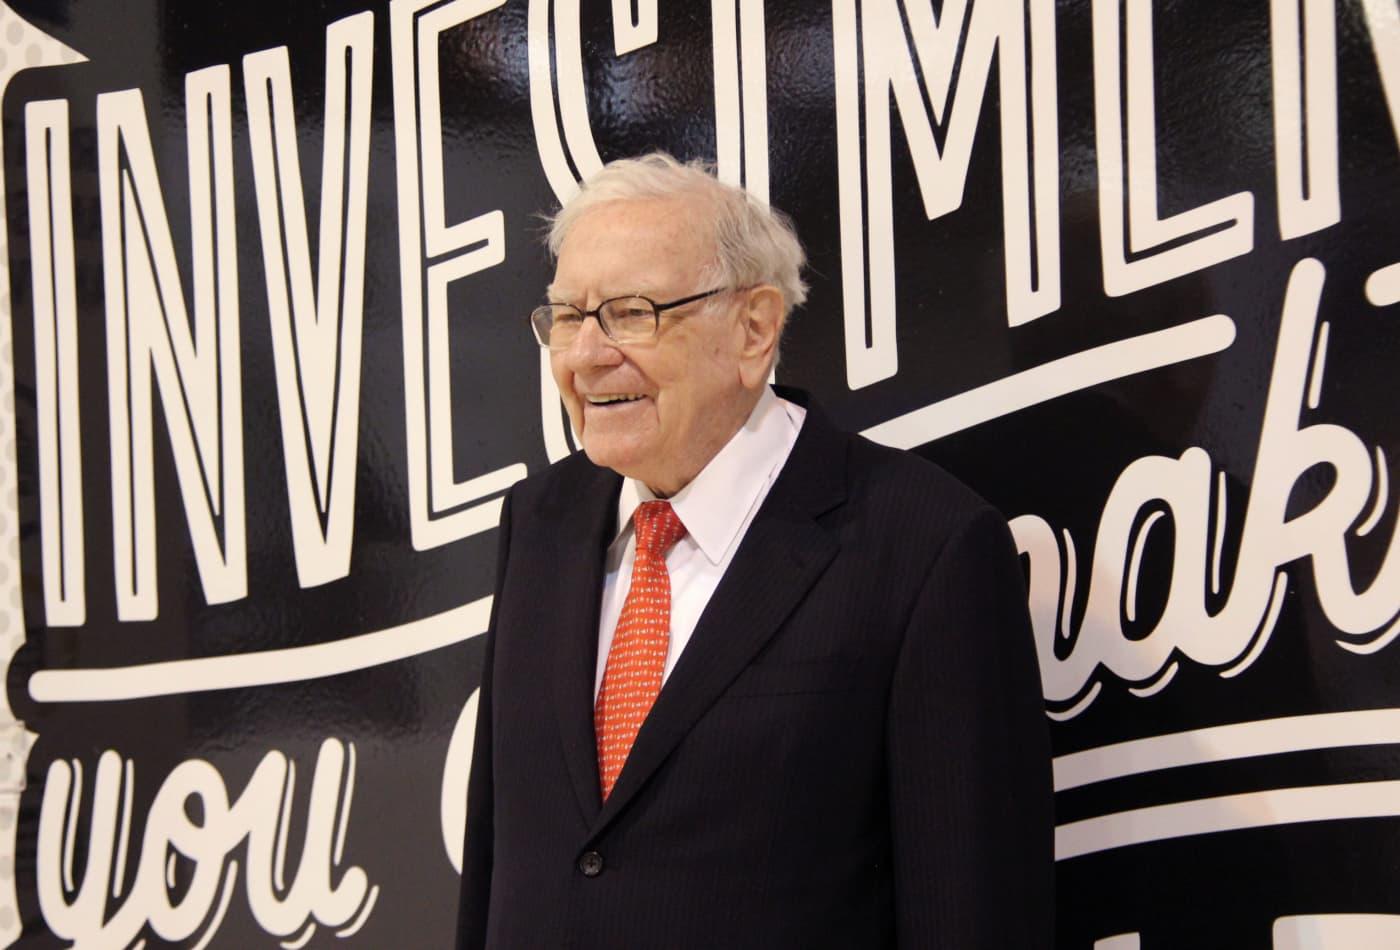 Buffett has the majority of Berkshire's massive portfolio in just 5 stocks. Here's what they are: